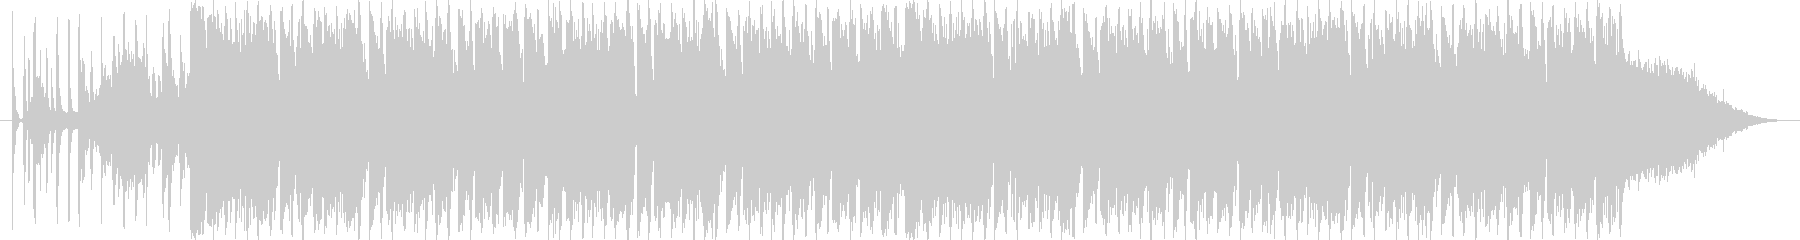 TV番組、ラジオ向けのBGM。エレクト…の未再生の波形